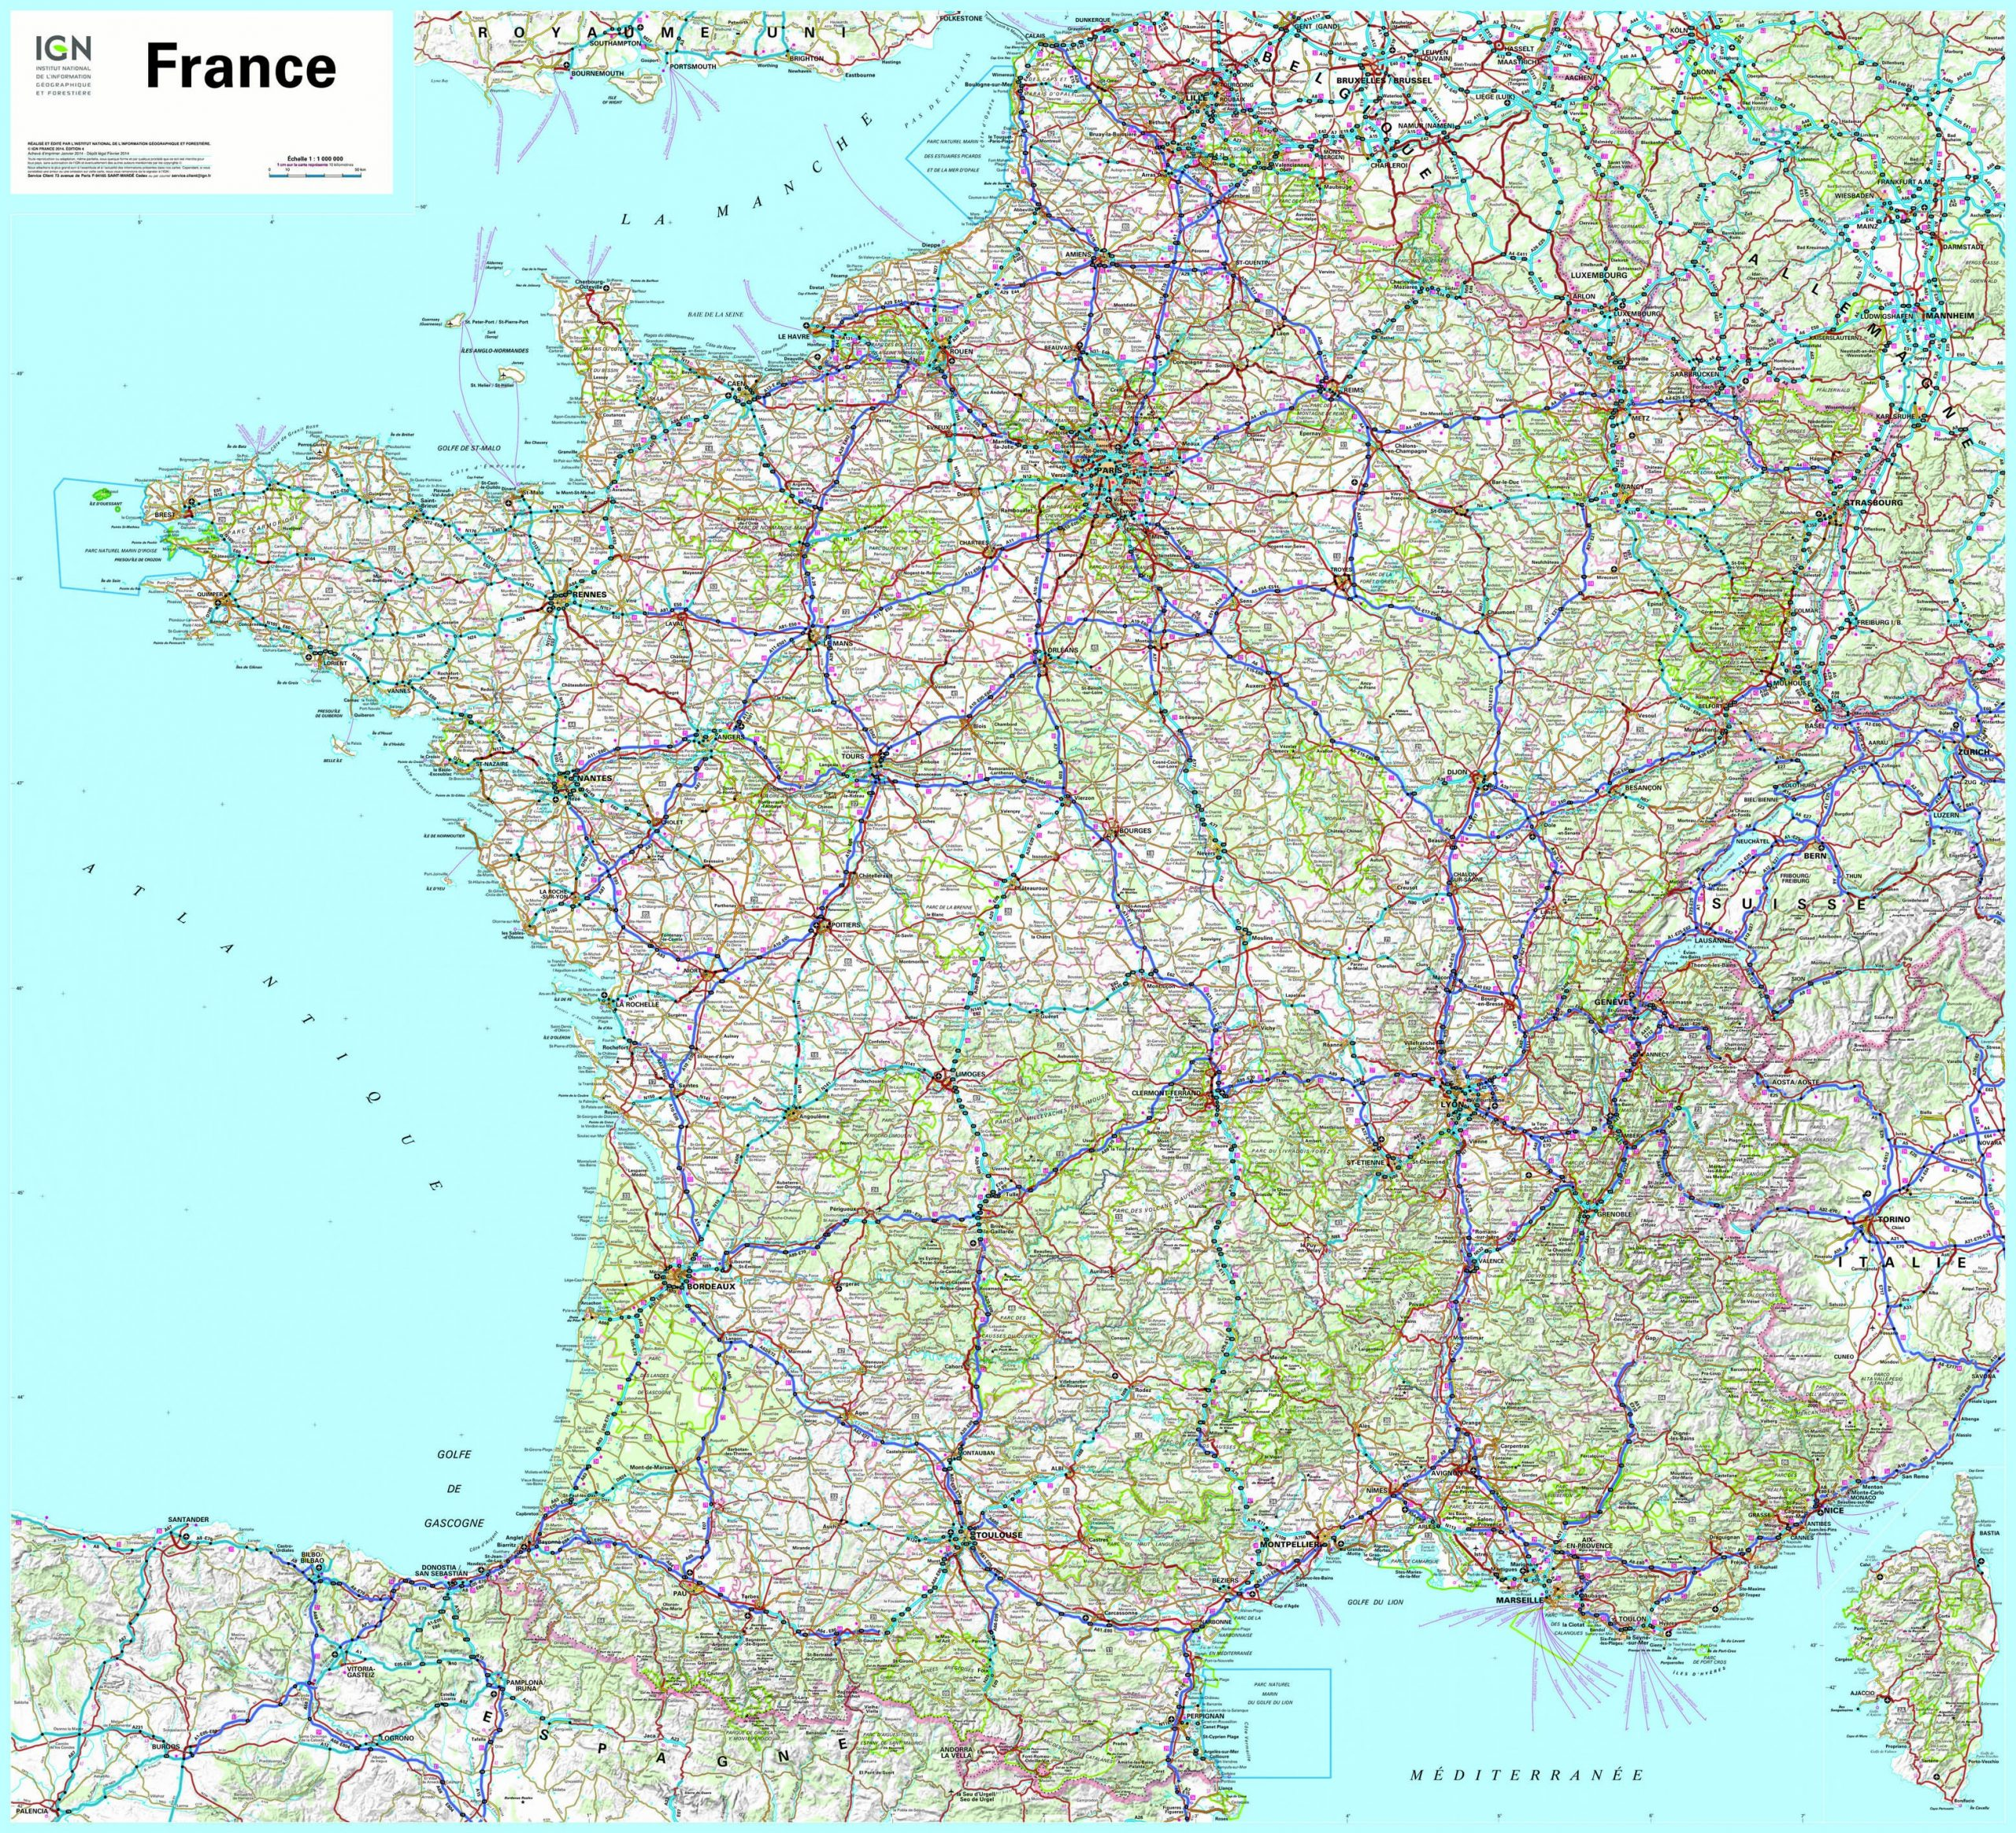 Cartograf.fr : Carte France : Page 3 concernant Carte De France A Imprimer